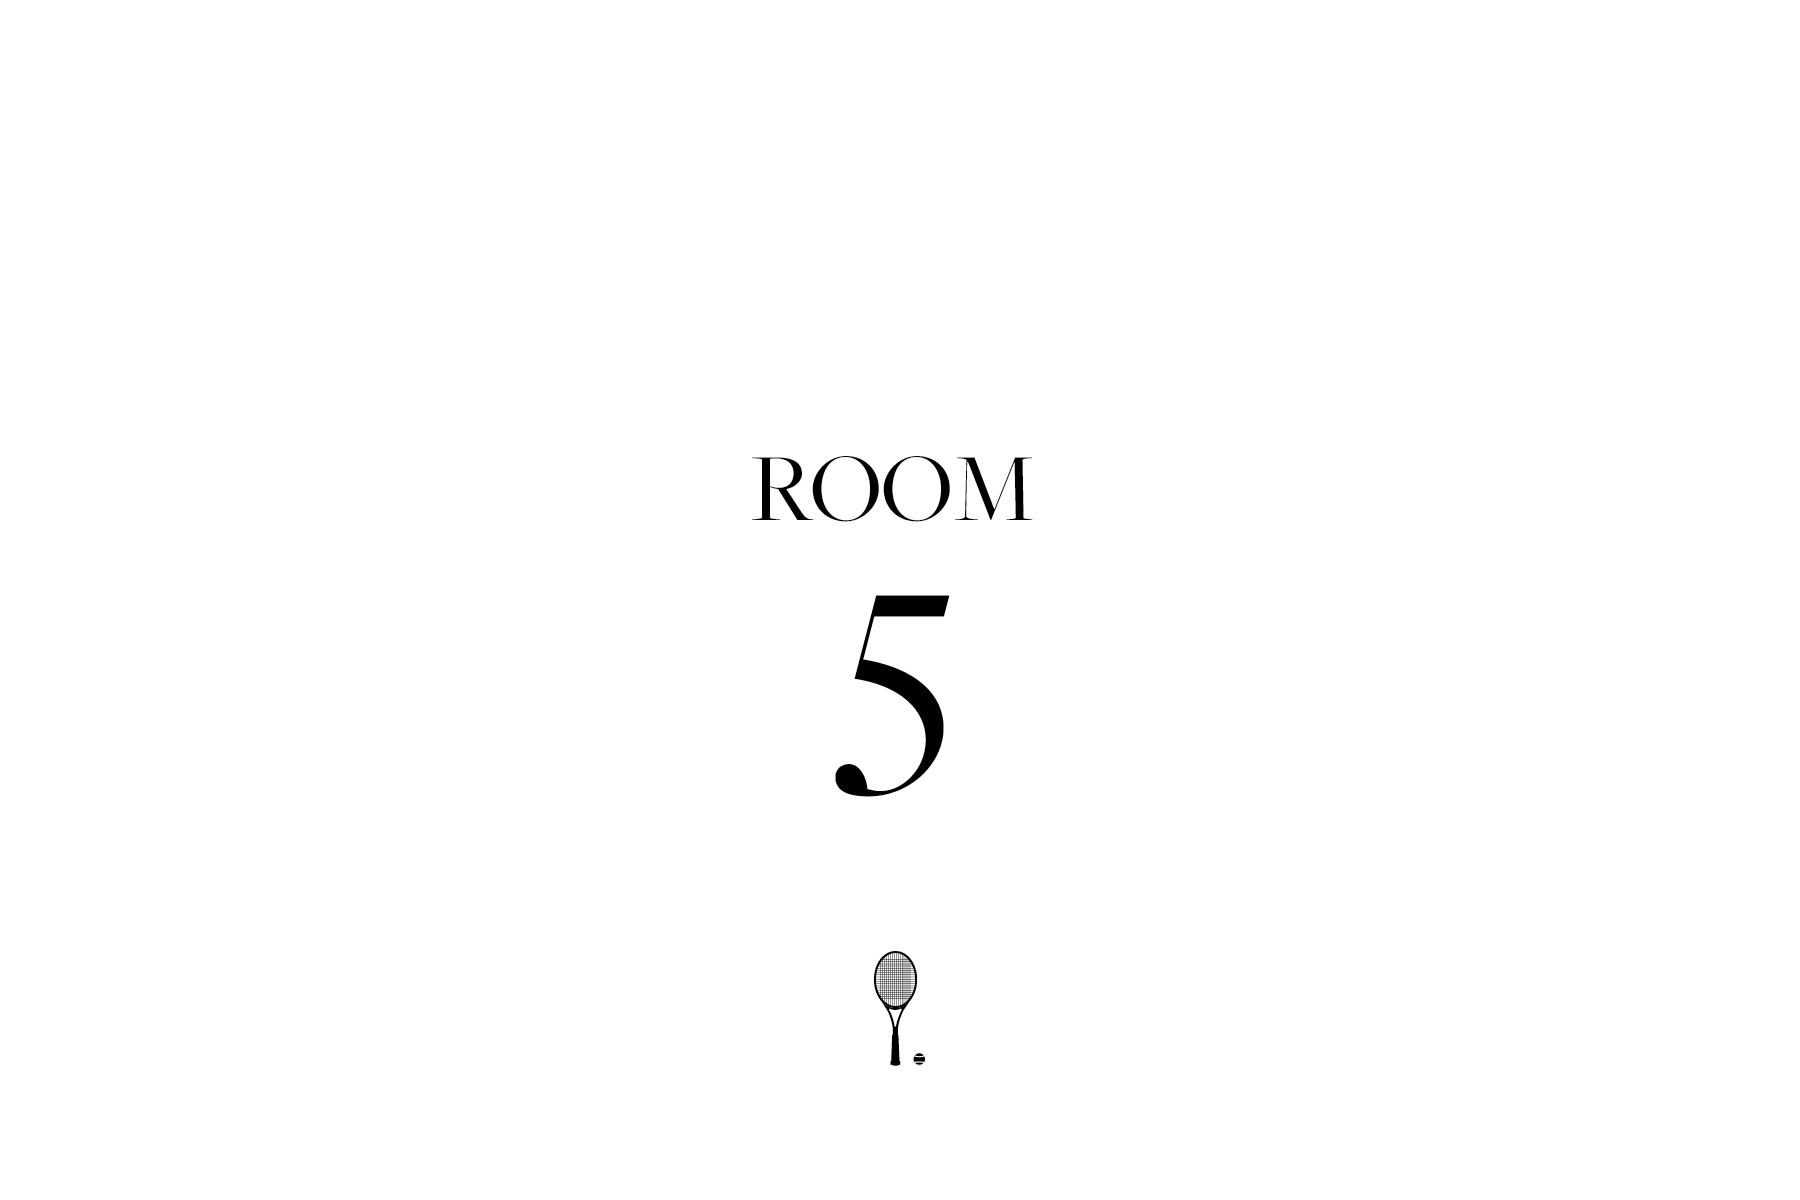 Room 5 Sign.jpg